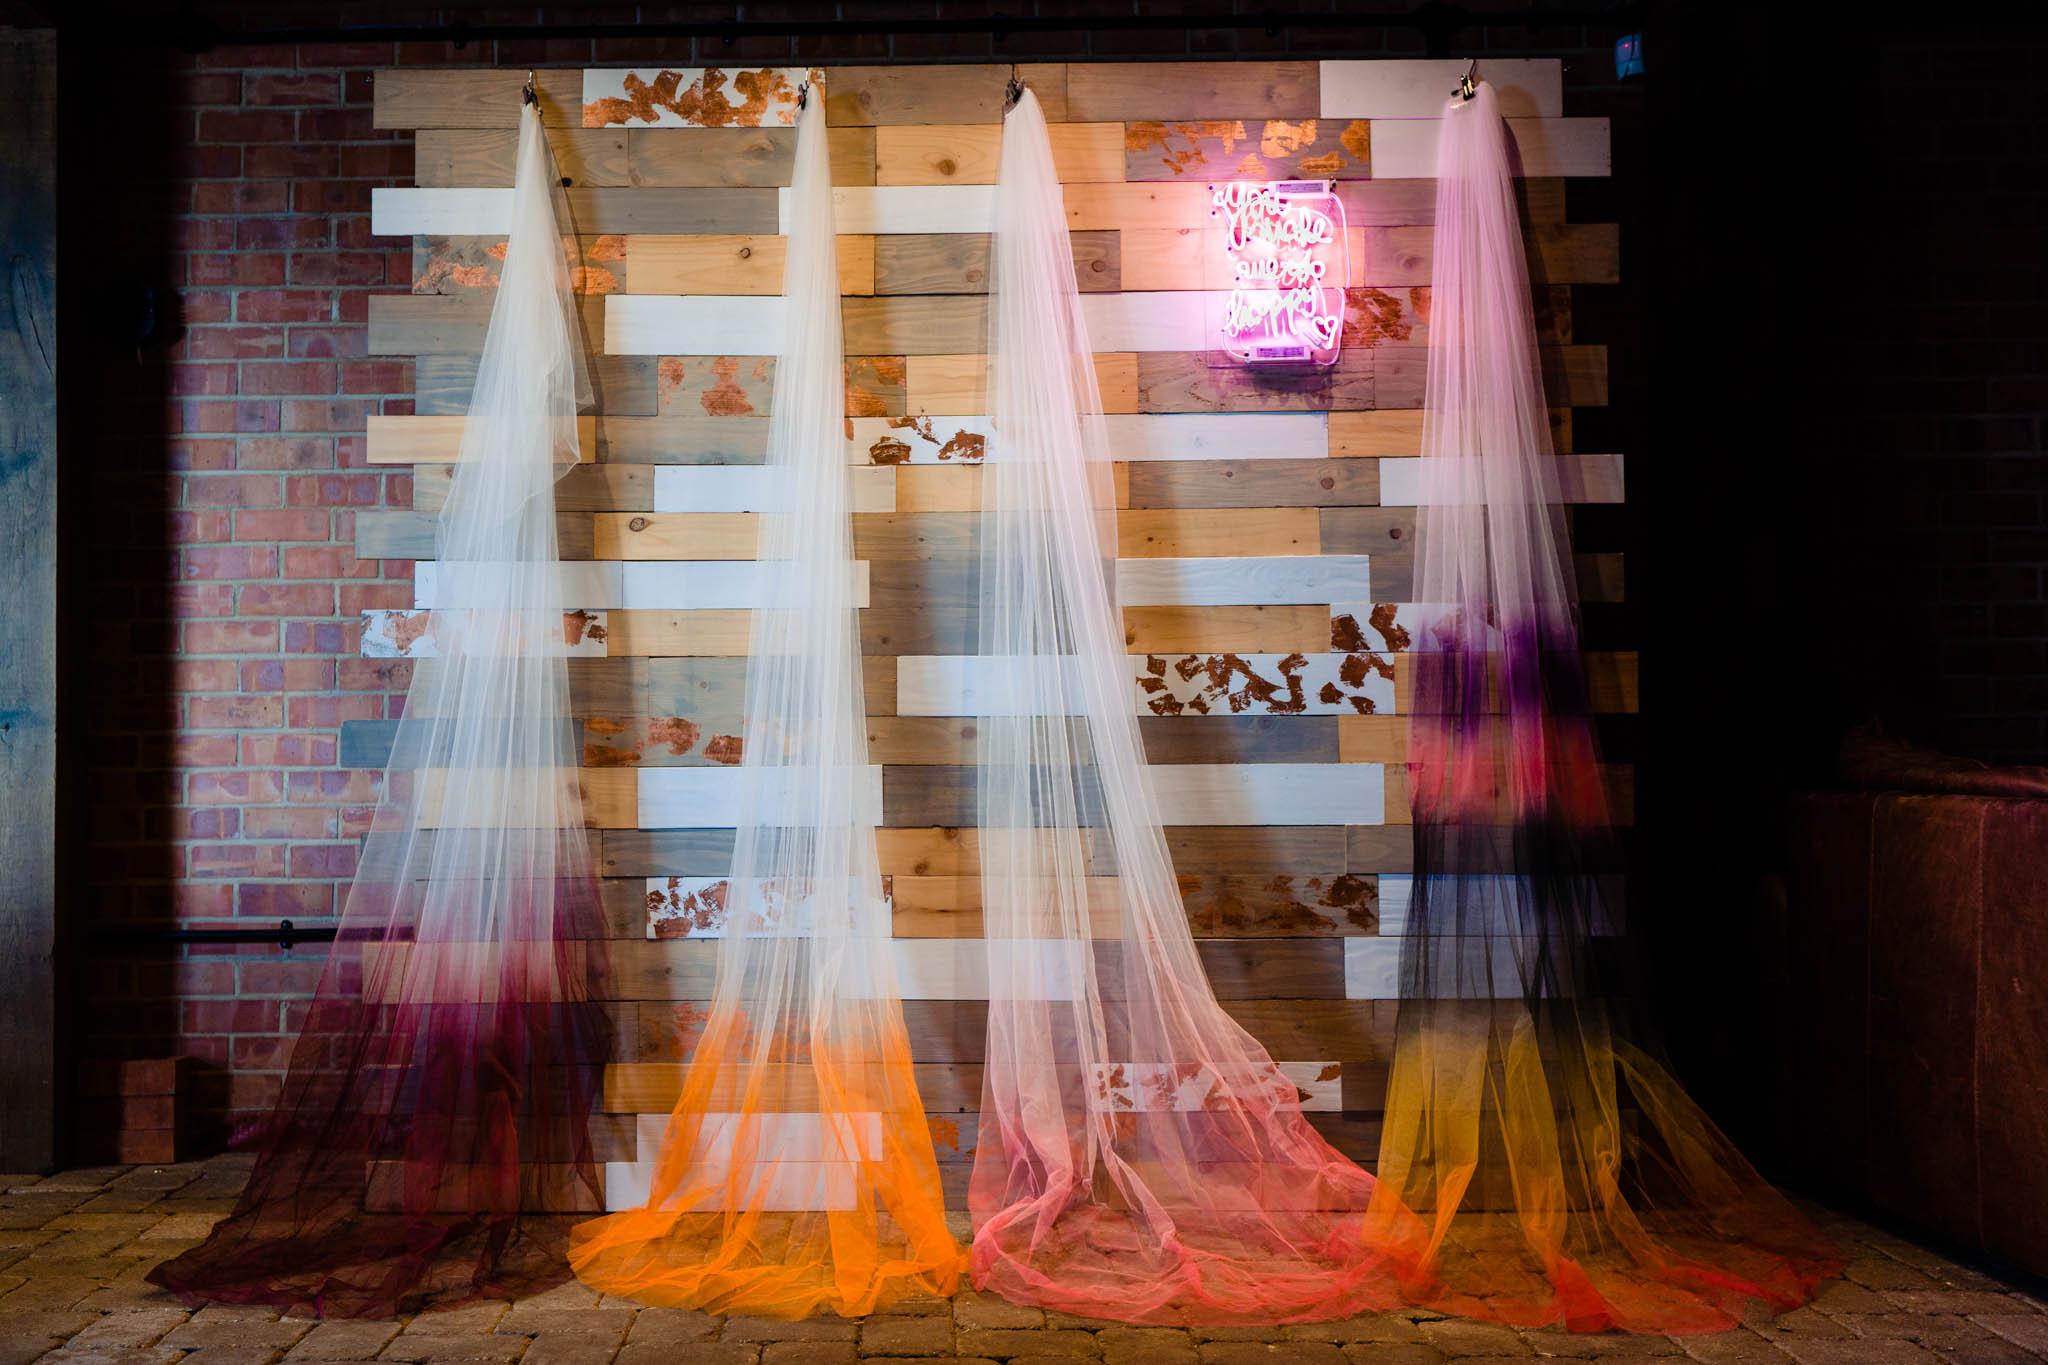 dip dye wedding veils - ombre wedding veils - east midlands wedding planner - derby wedding planner - nottingham wedding planner - leicester wedding planner